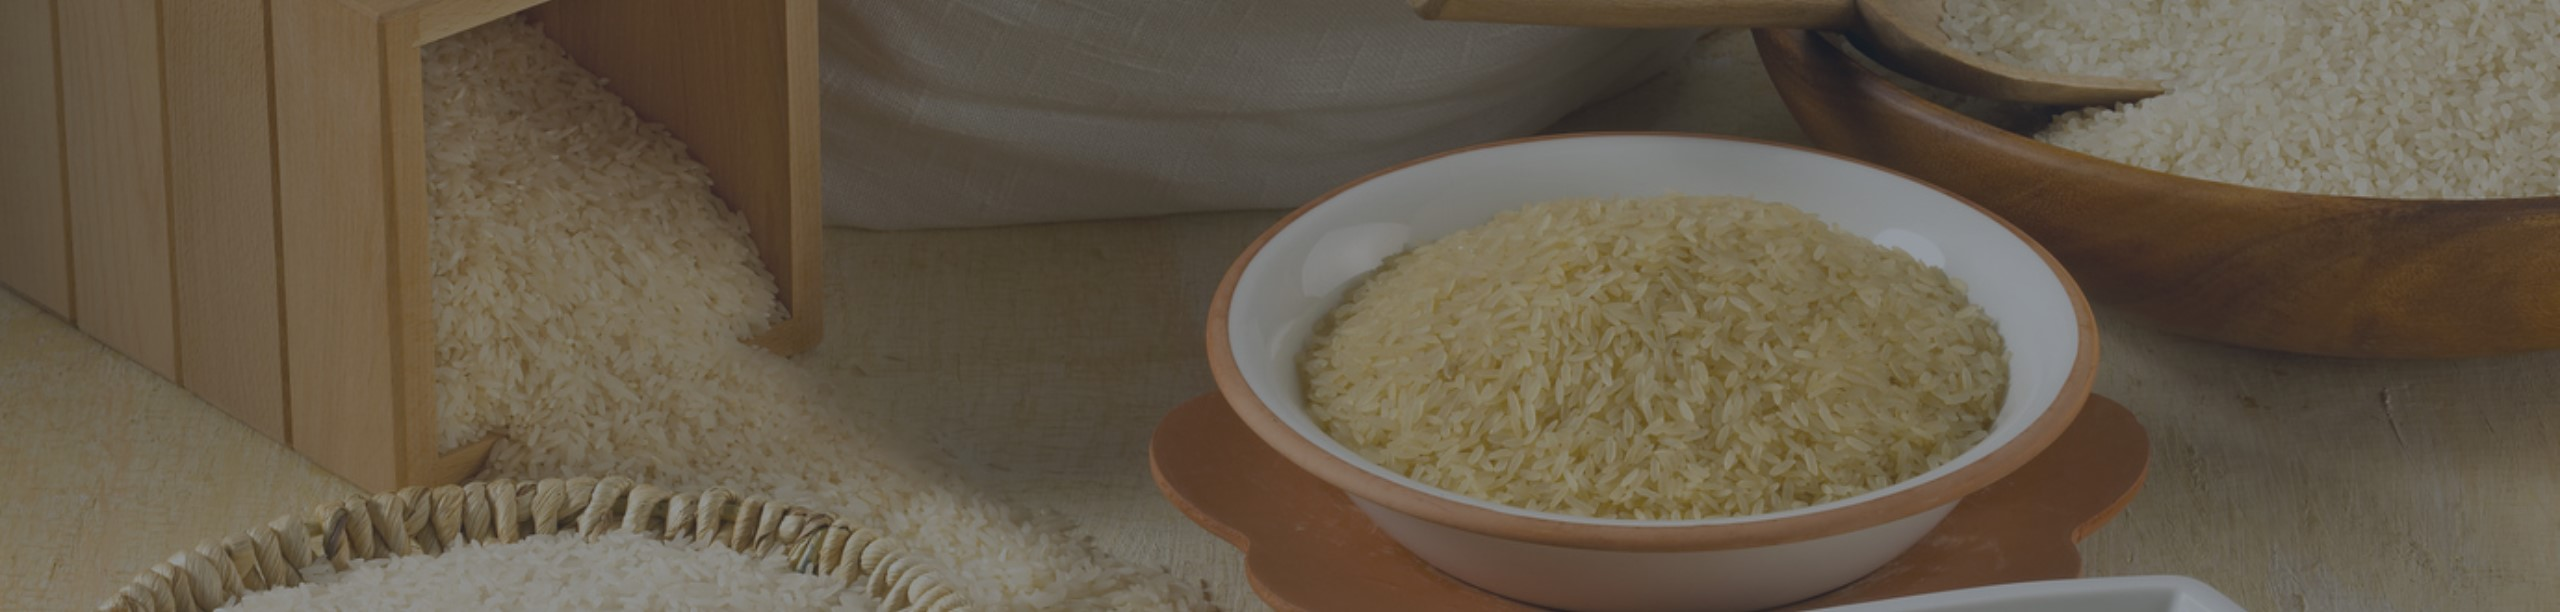 Rice2-1